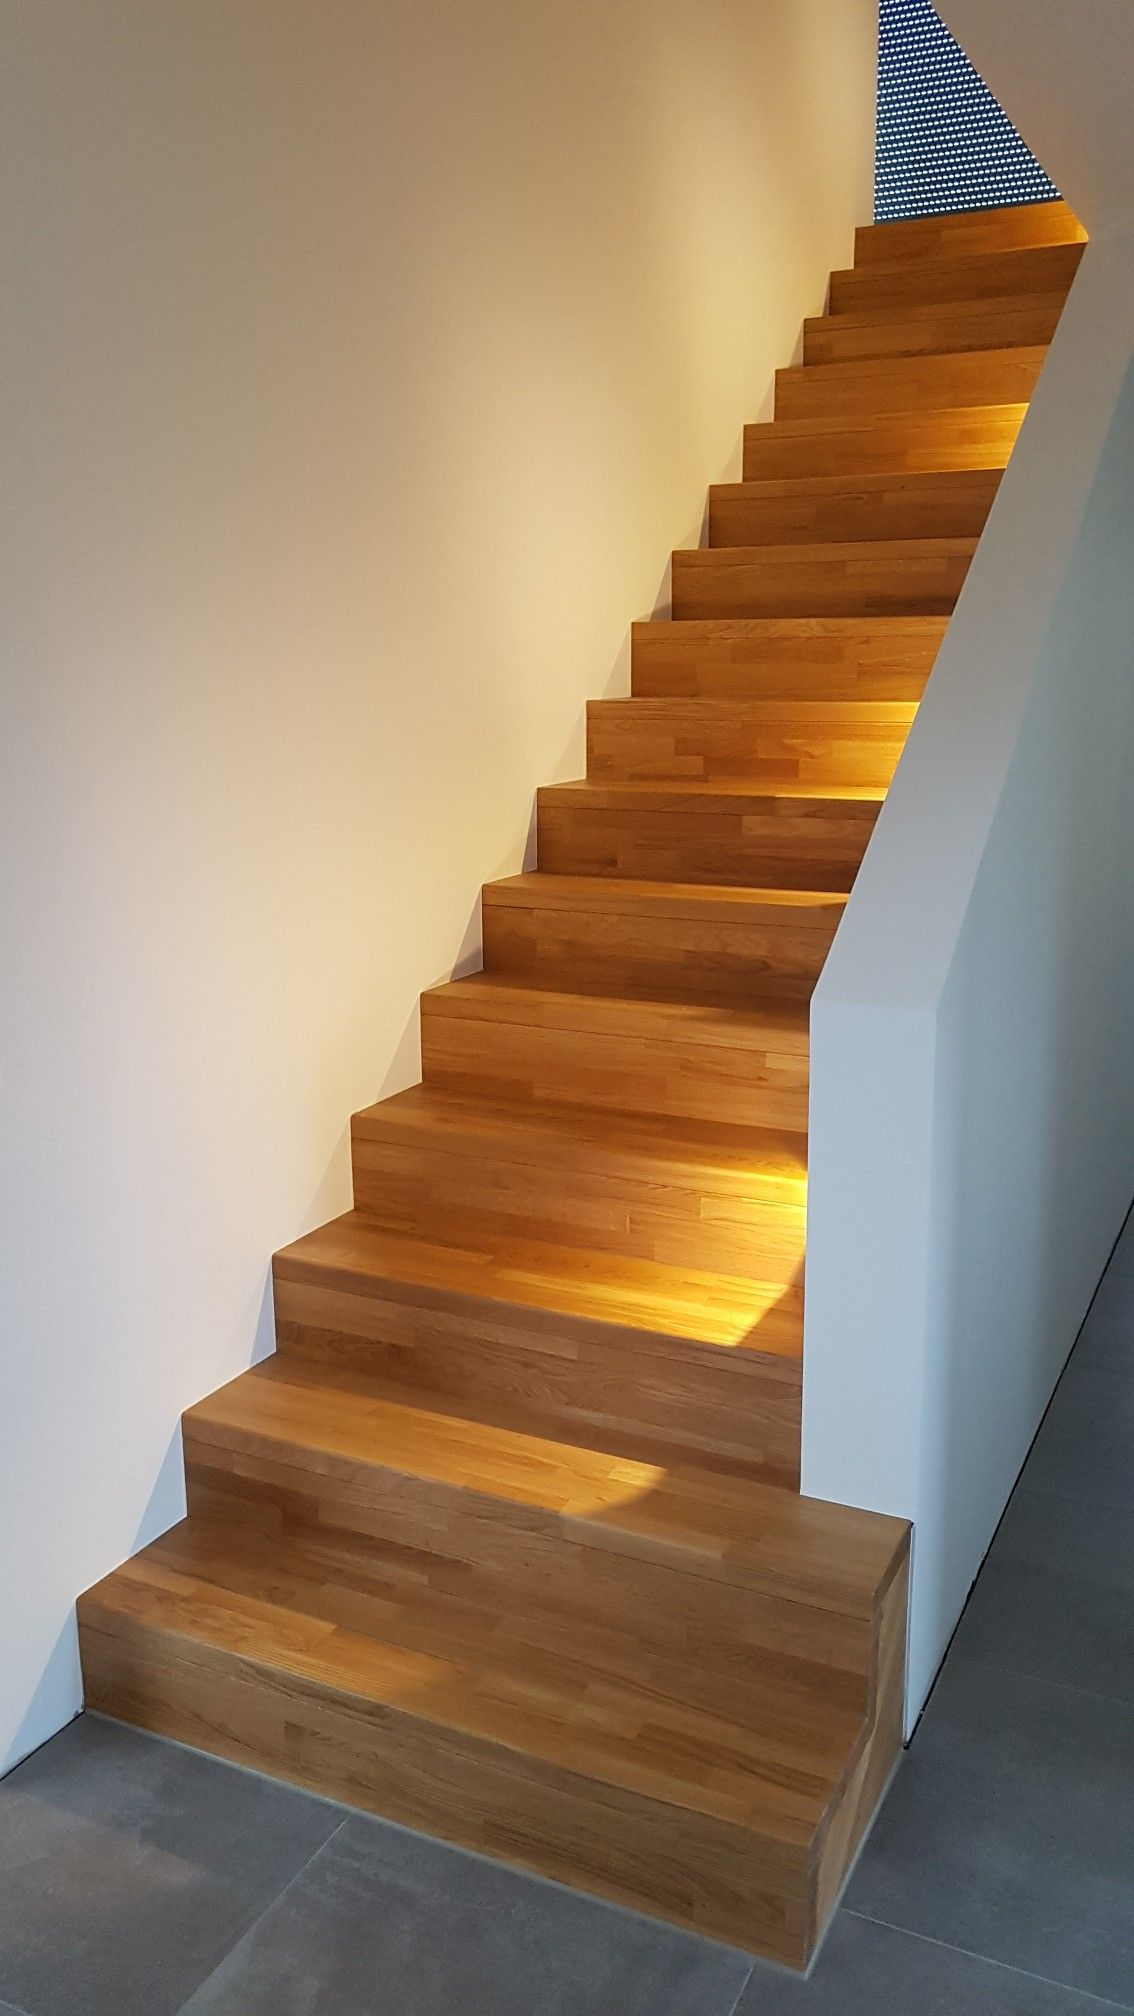 Gerade Treppe Beleuchtung Eiche Treppenbeleuchtung Treppe Treppe Haus